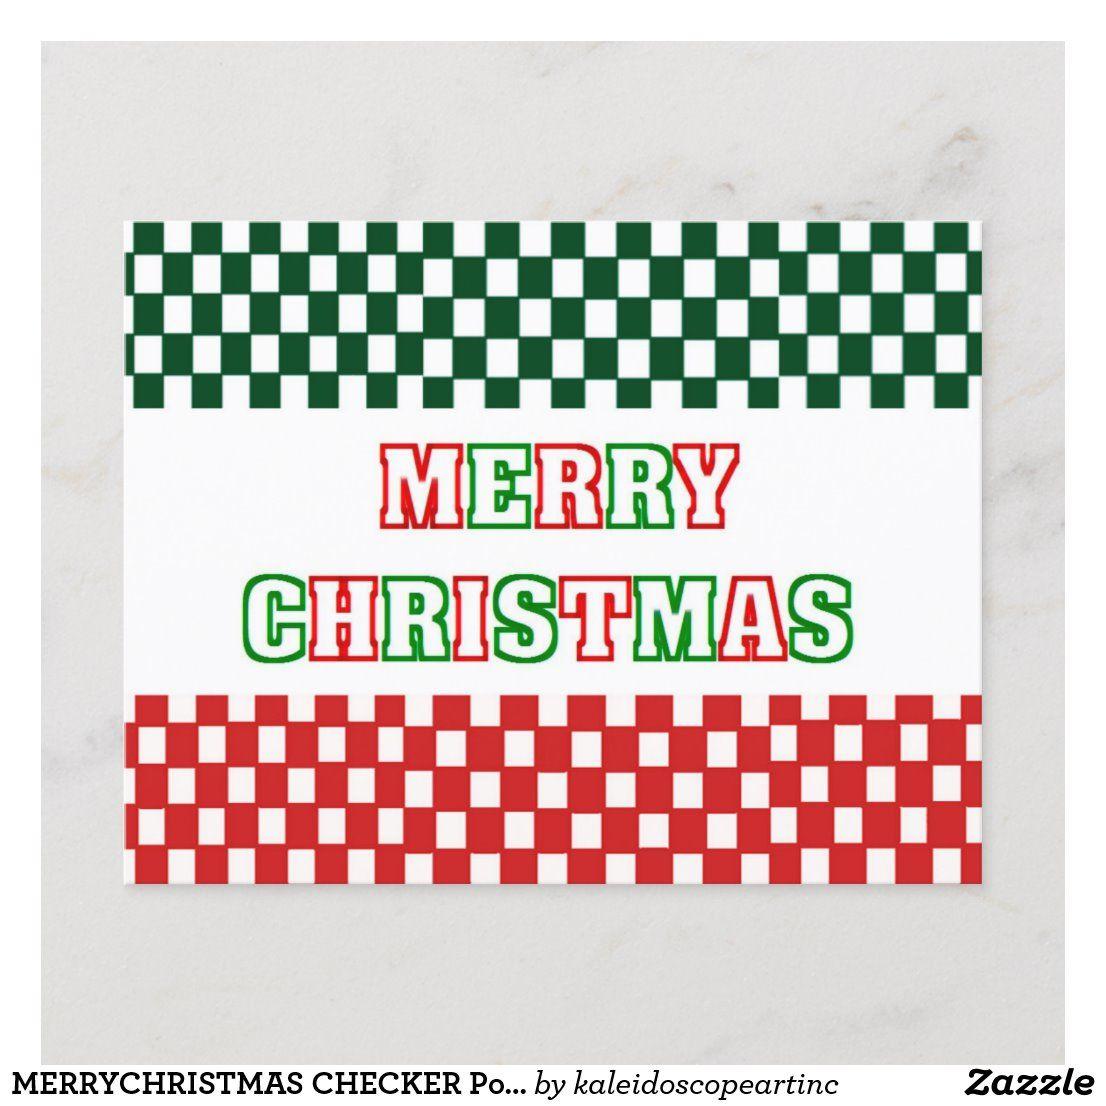 MERRYCHRISTMAS CHECKER Postcard